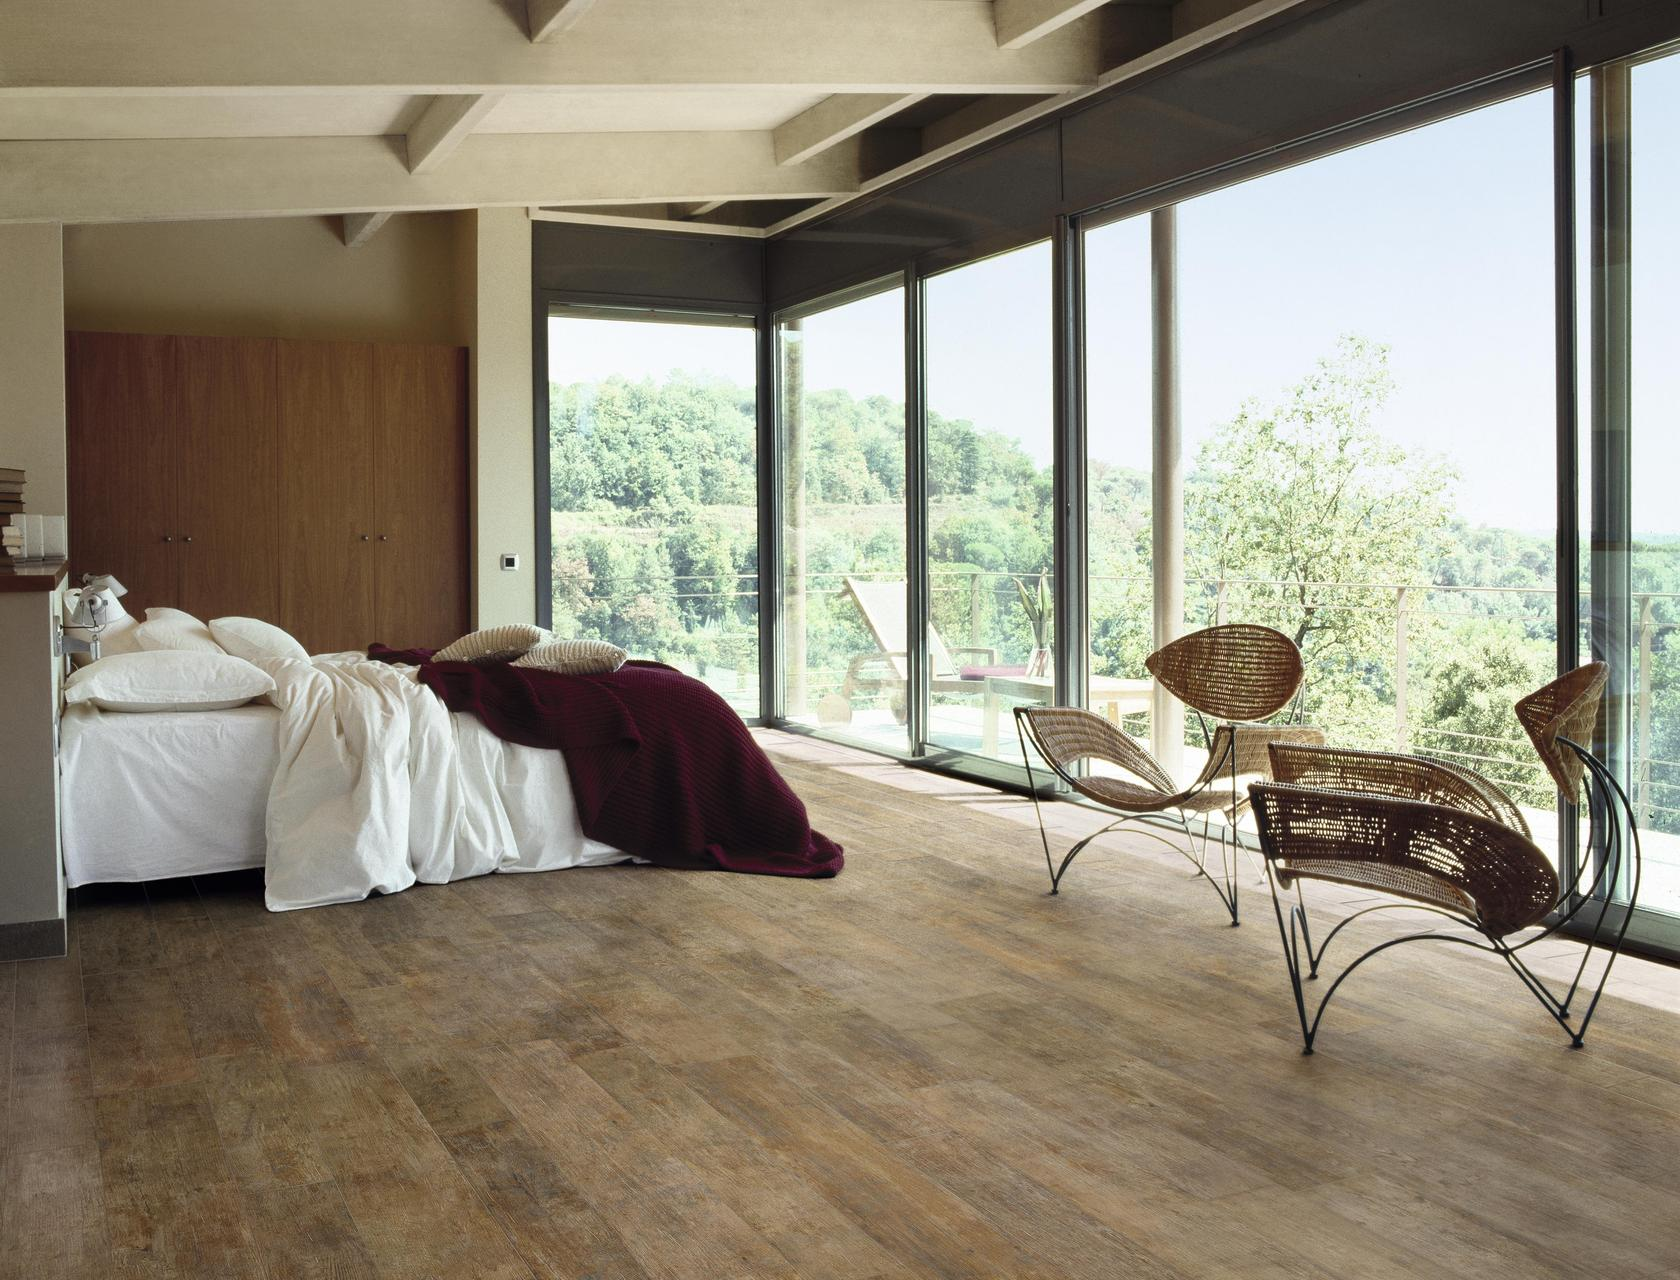 caesar tonbridge porcelain kent floors flooring ceasar products and naos our tiles